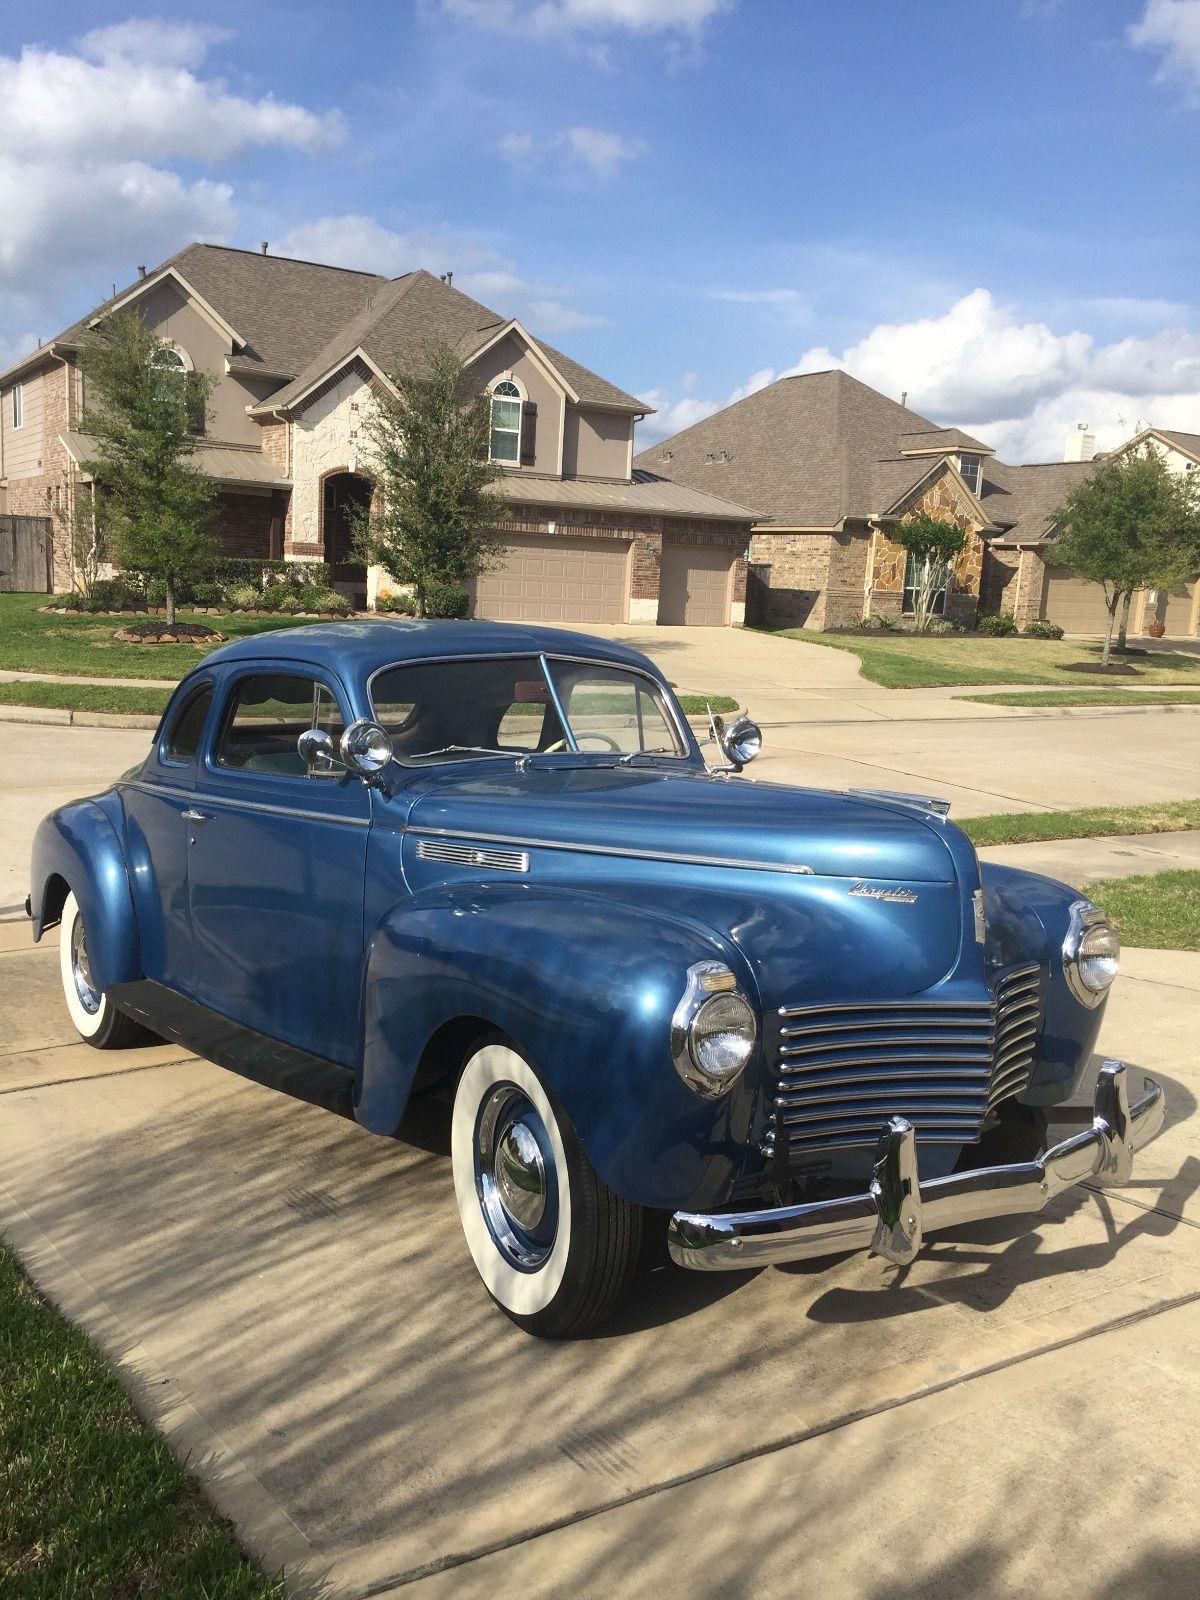 1940 Chrysler Windsor | Mopar, Cars and Motor vehicle